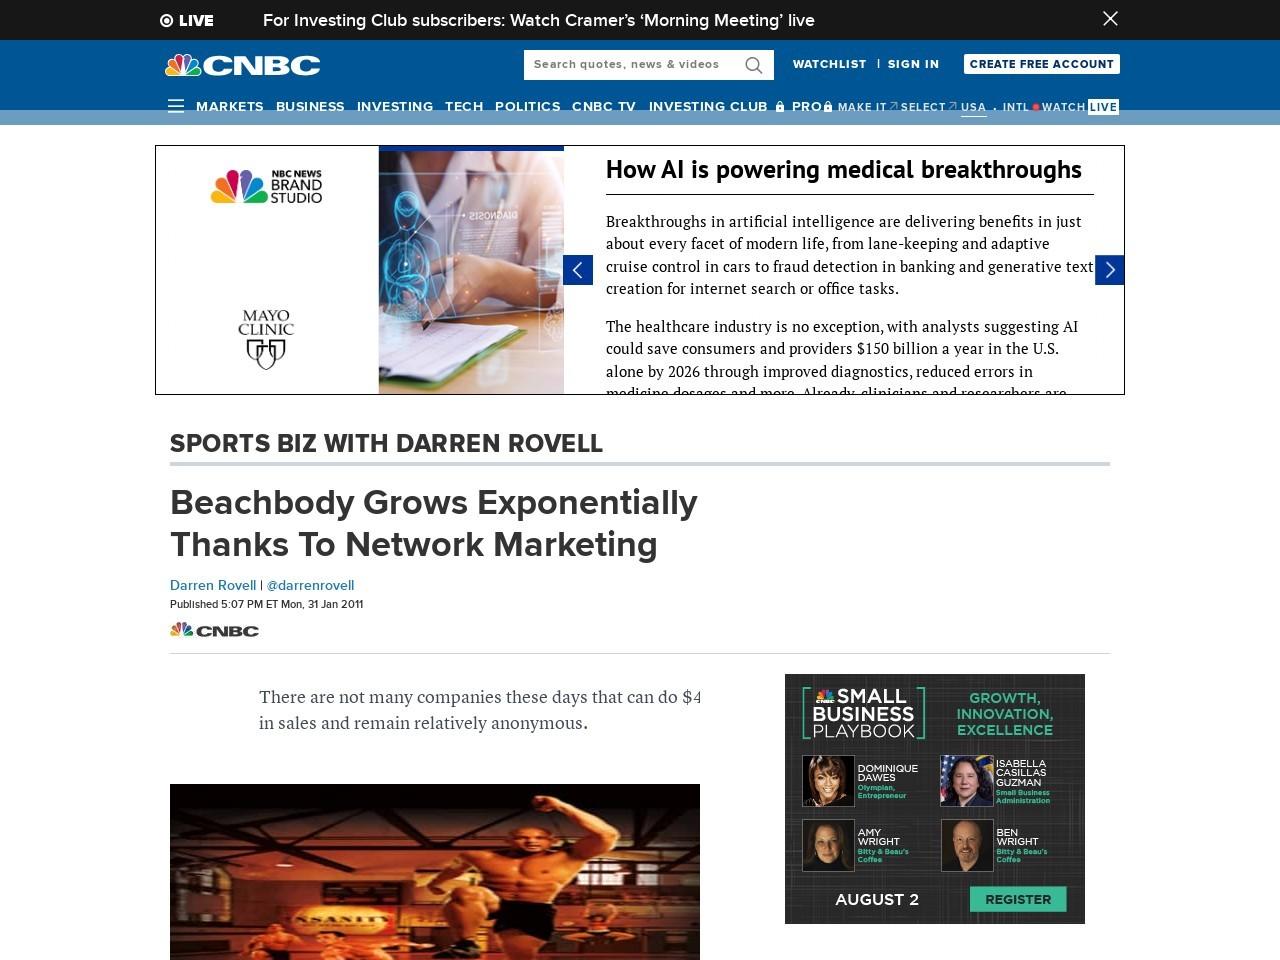 Beachbody Grows Exponentially Thanks To Network Marketing